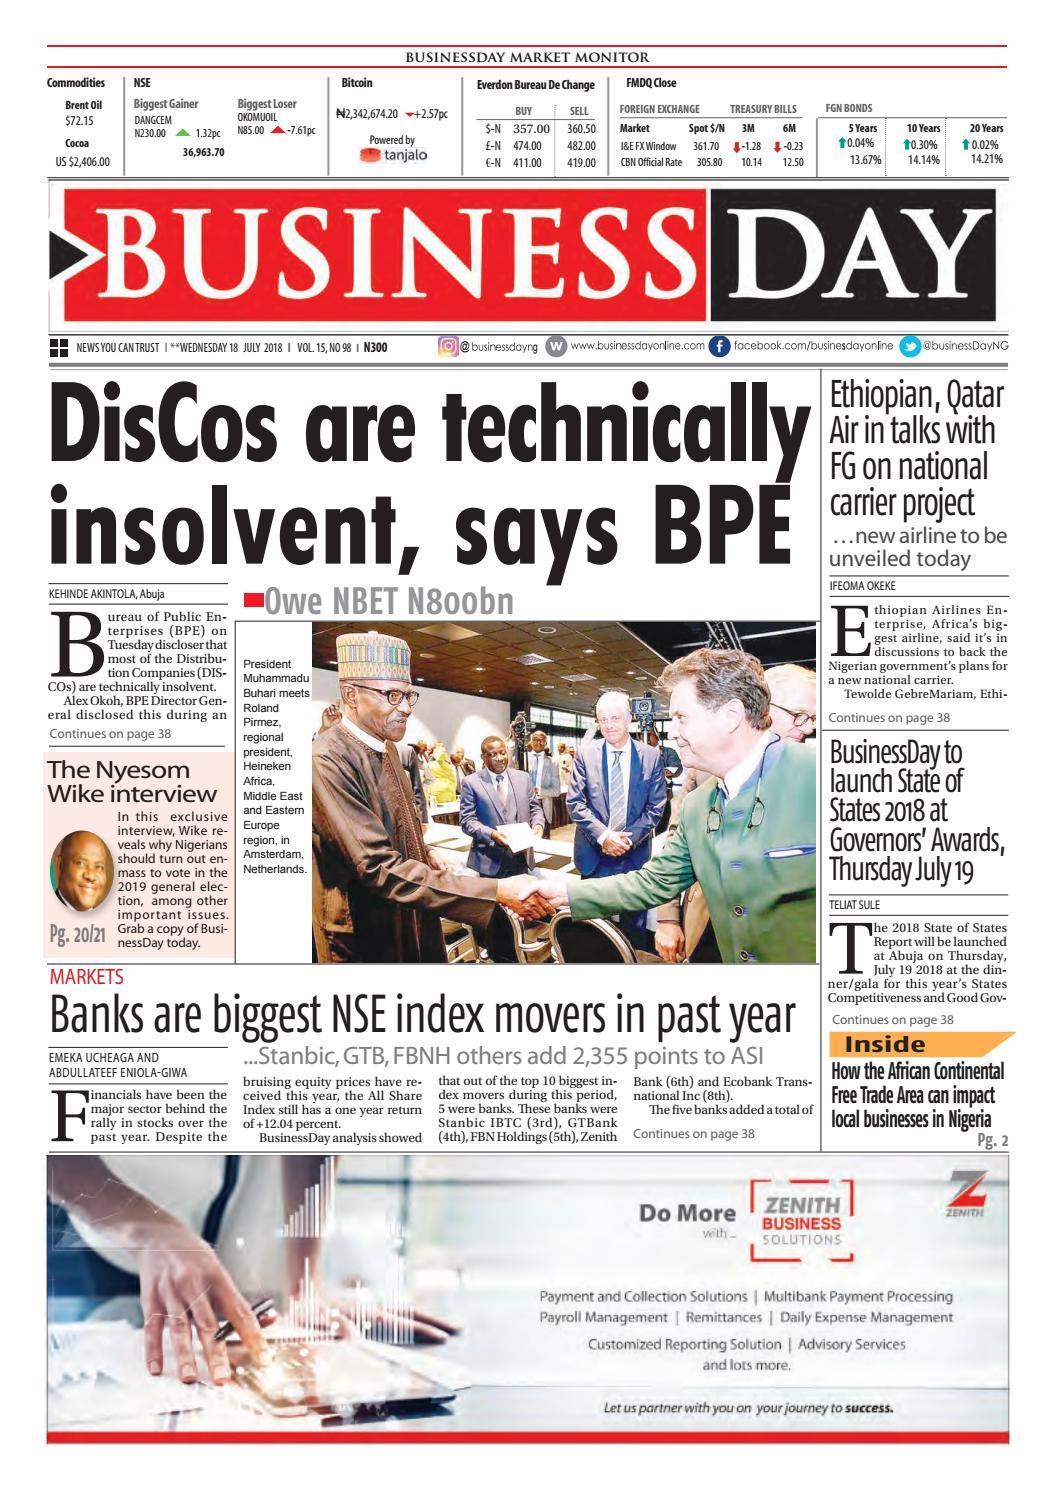 BusinessDay 18 Jul 2018